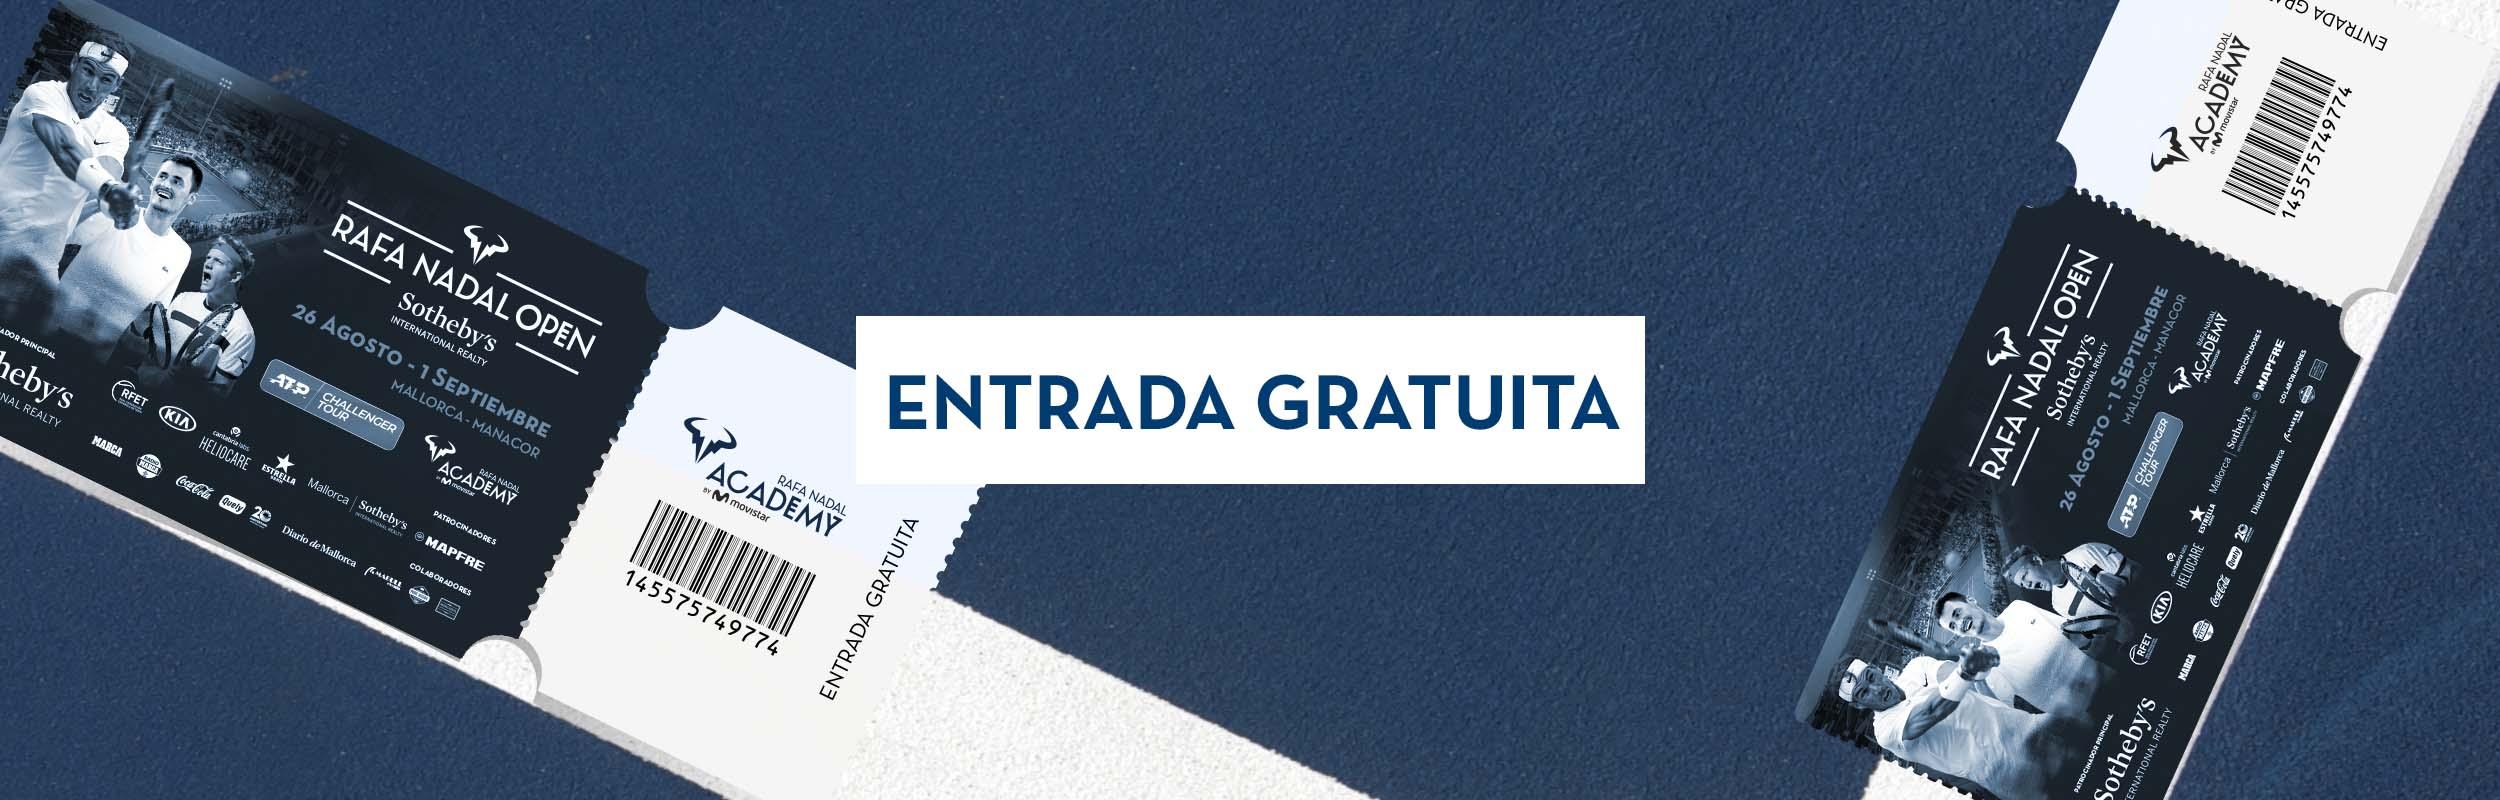 [Mallorca] Gratis zu den Rafa Nadal Open 26.08. - 01.09. z.B. mit Andy Murray, Mischa Zverev